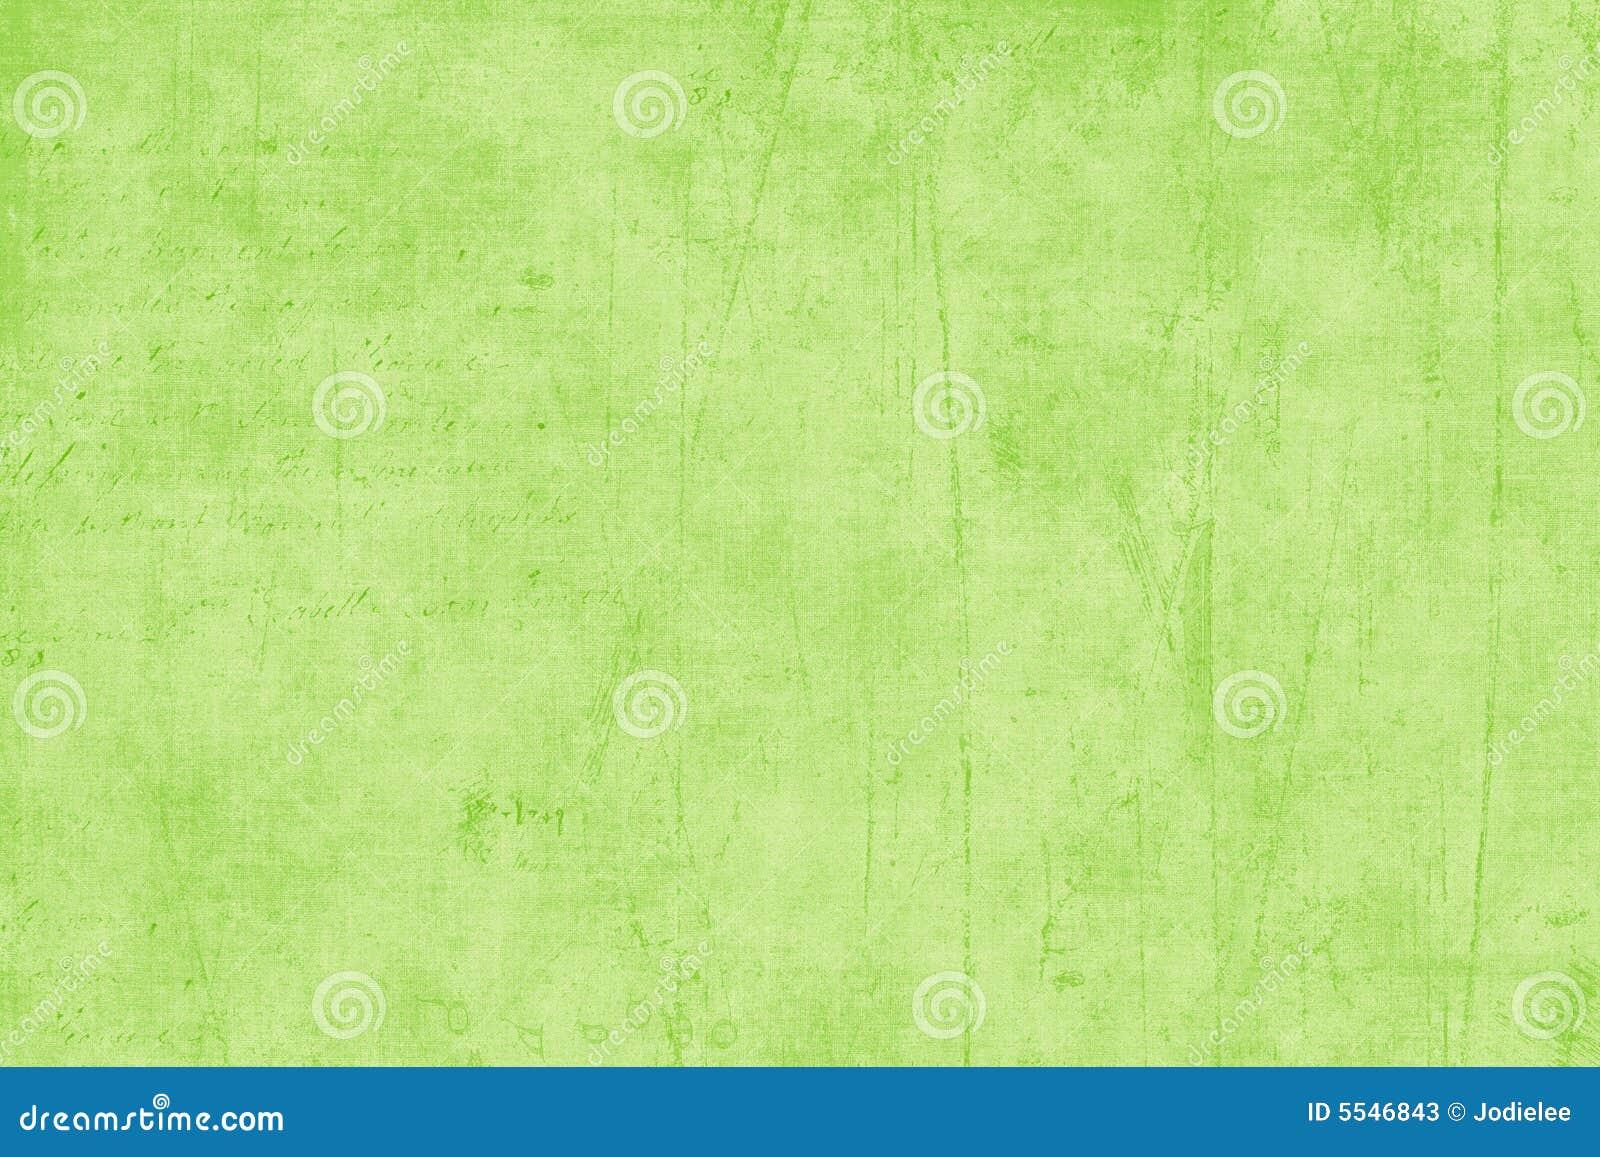 Green Textured Scrapbook Paper Stock Image - Image of